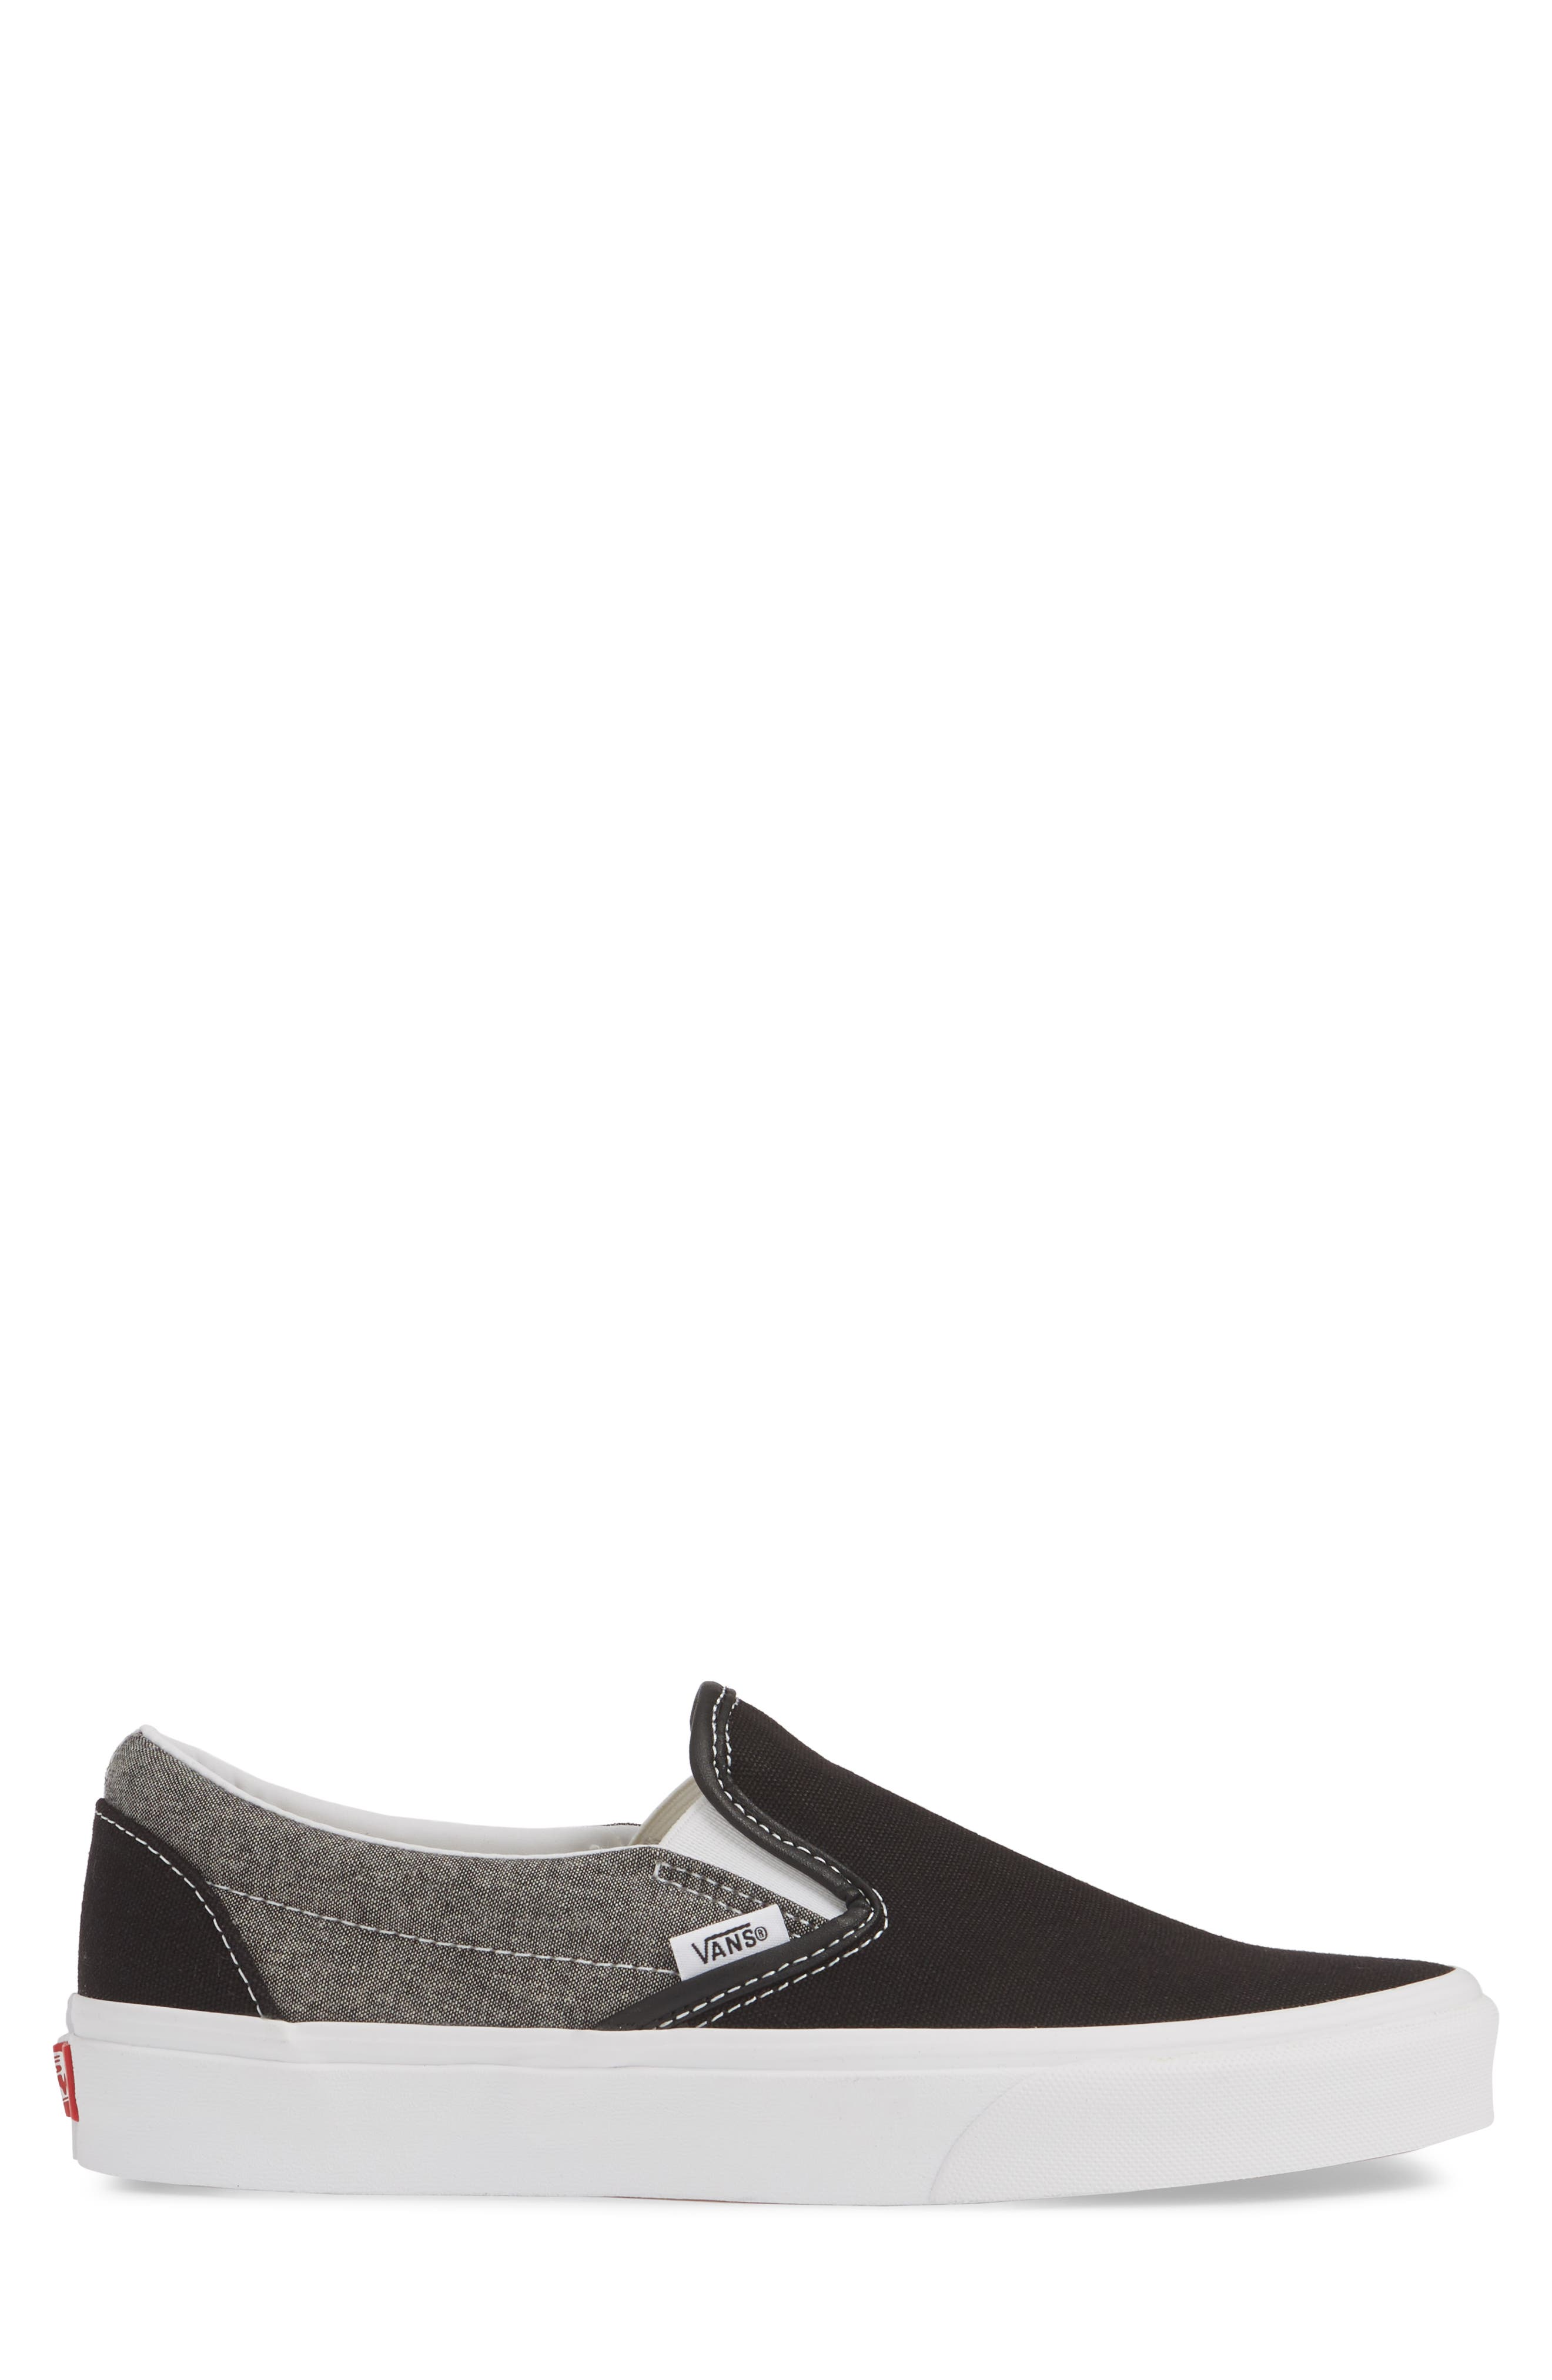 VANS, 'Classic' Slip-On Sneaker, Alternate thumbnail 3, color, CANVAS BLACK/ WHITE CHAMBRAY